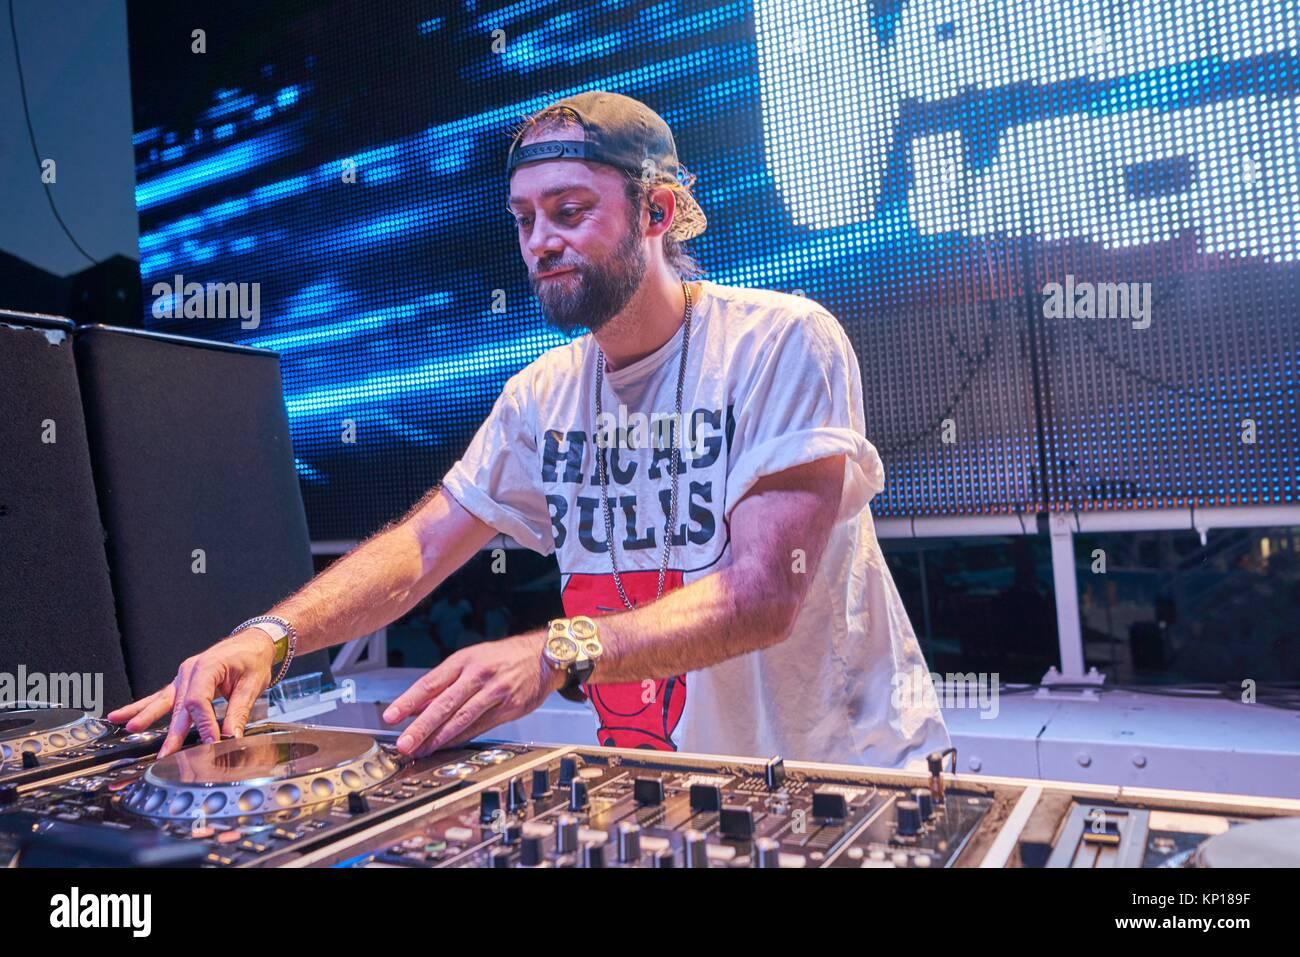 DJ Vato Gonzalez at music festival Starbeach in Hersonissos, Crete, Greece, on 24. July 2017 - Stock Image